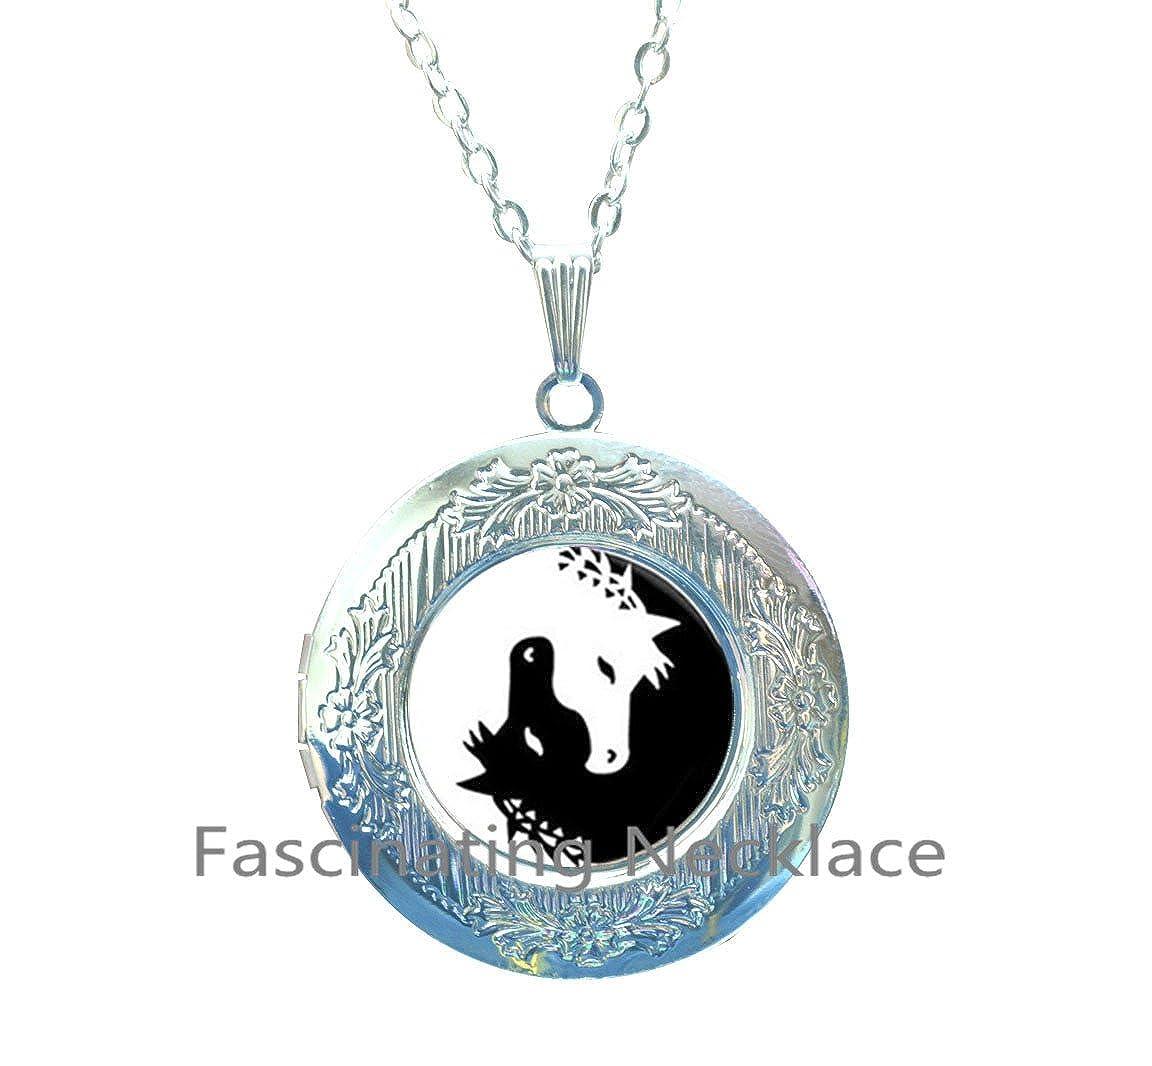 Horse Locket Necklace Jewelry Yin Yang Black and White Animals Art Locket Pendant Glass Photo Charms Photo medallion Locket Pendant Locket Necklace,AQ191